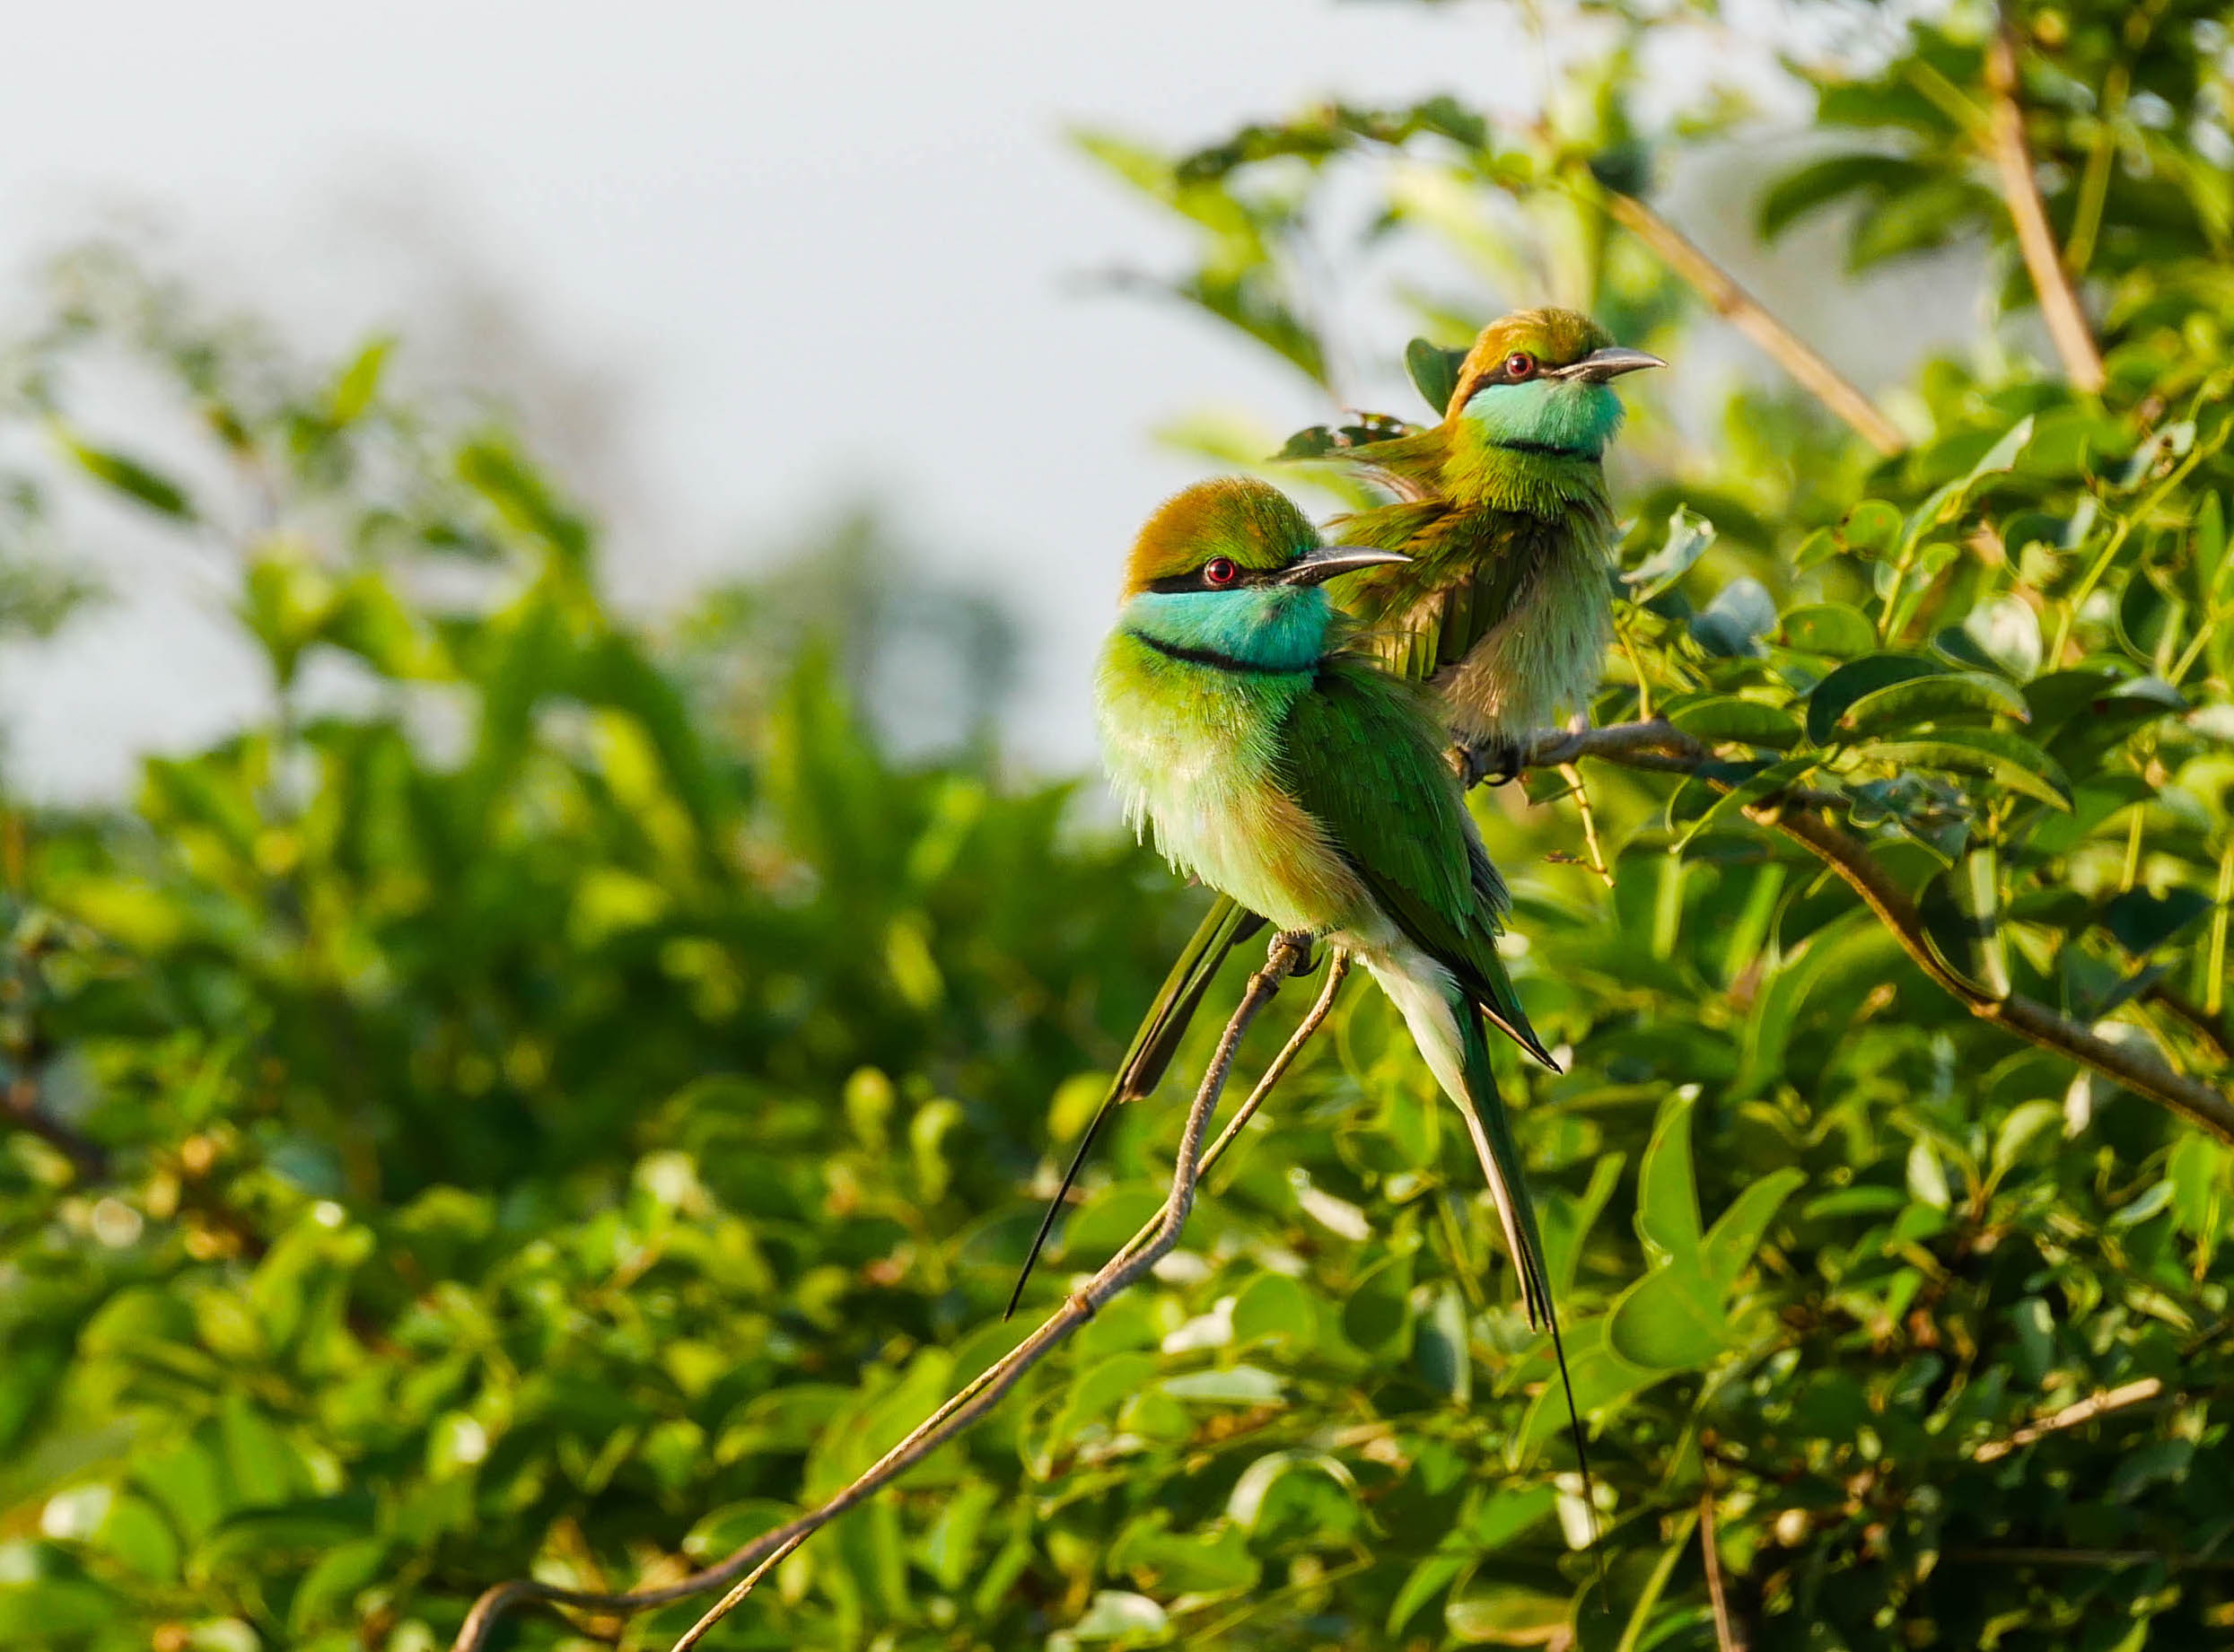 Sri Lanka, Wildlife photography, Little Green Bee Eater